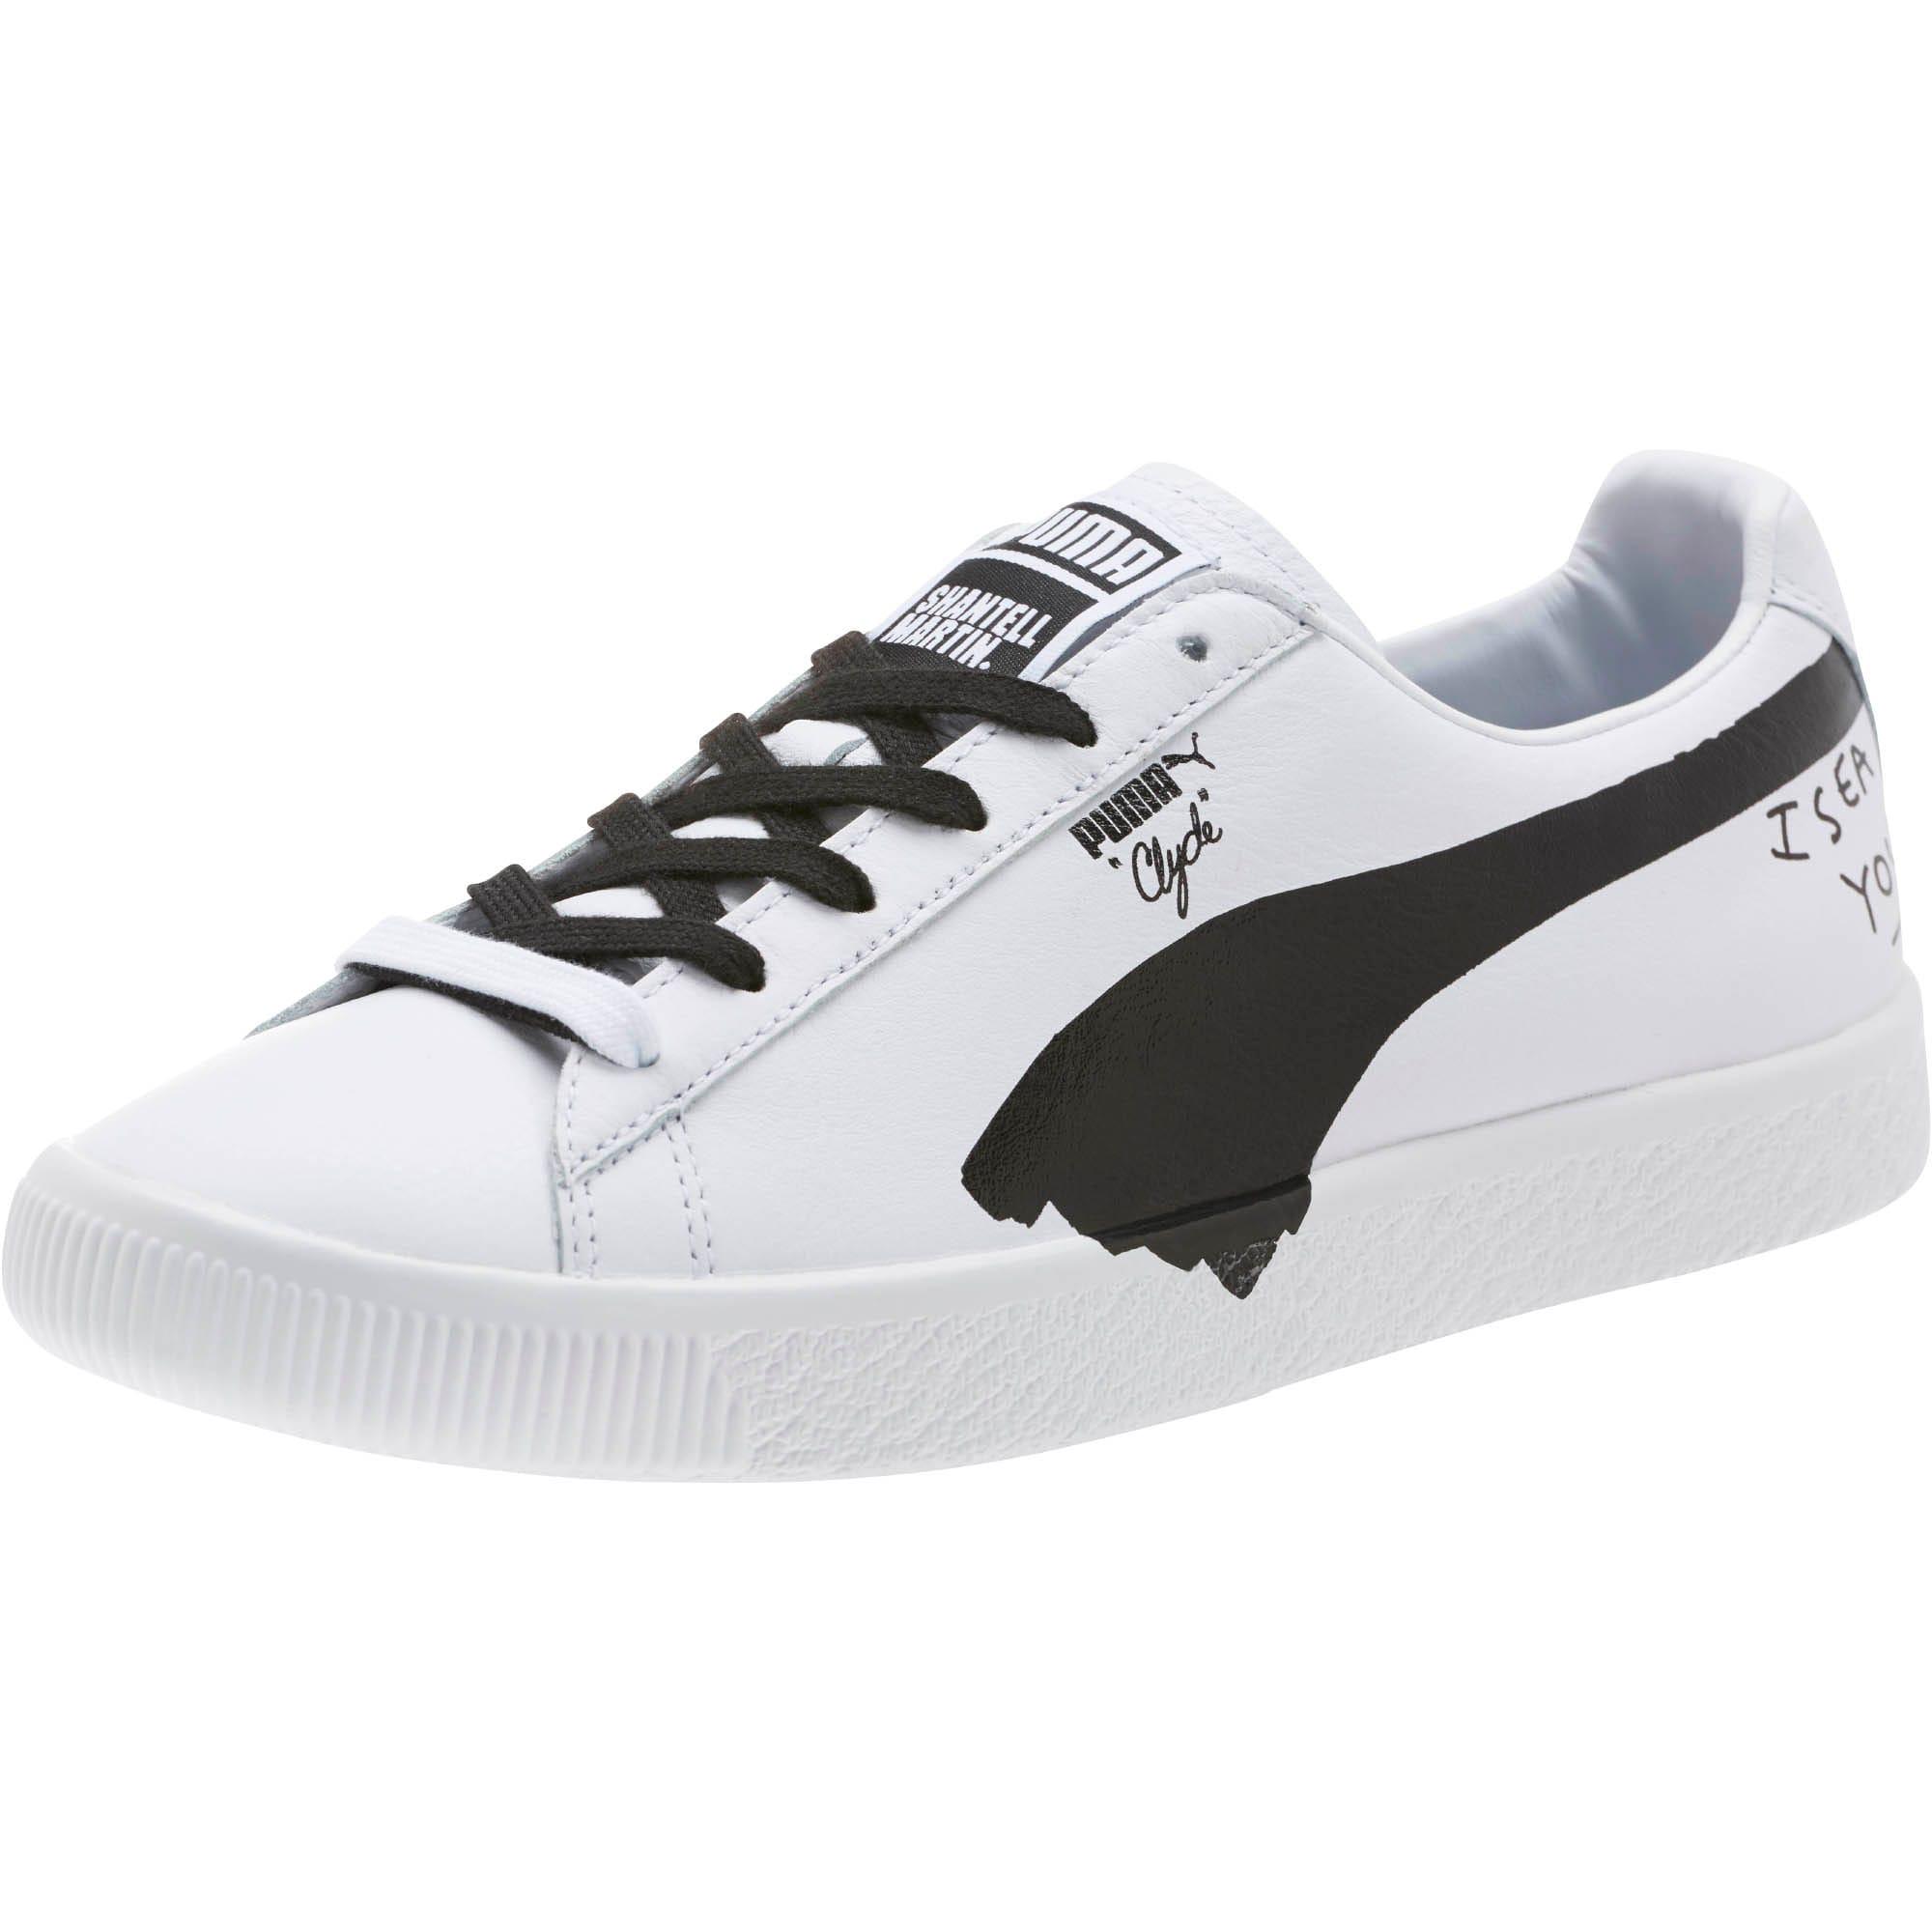 Thumbnail 1 of PUMA x SHANTELL MARTIN Clyde Sneakers, Puma White-Puma Black, medium